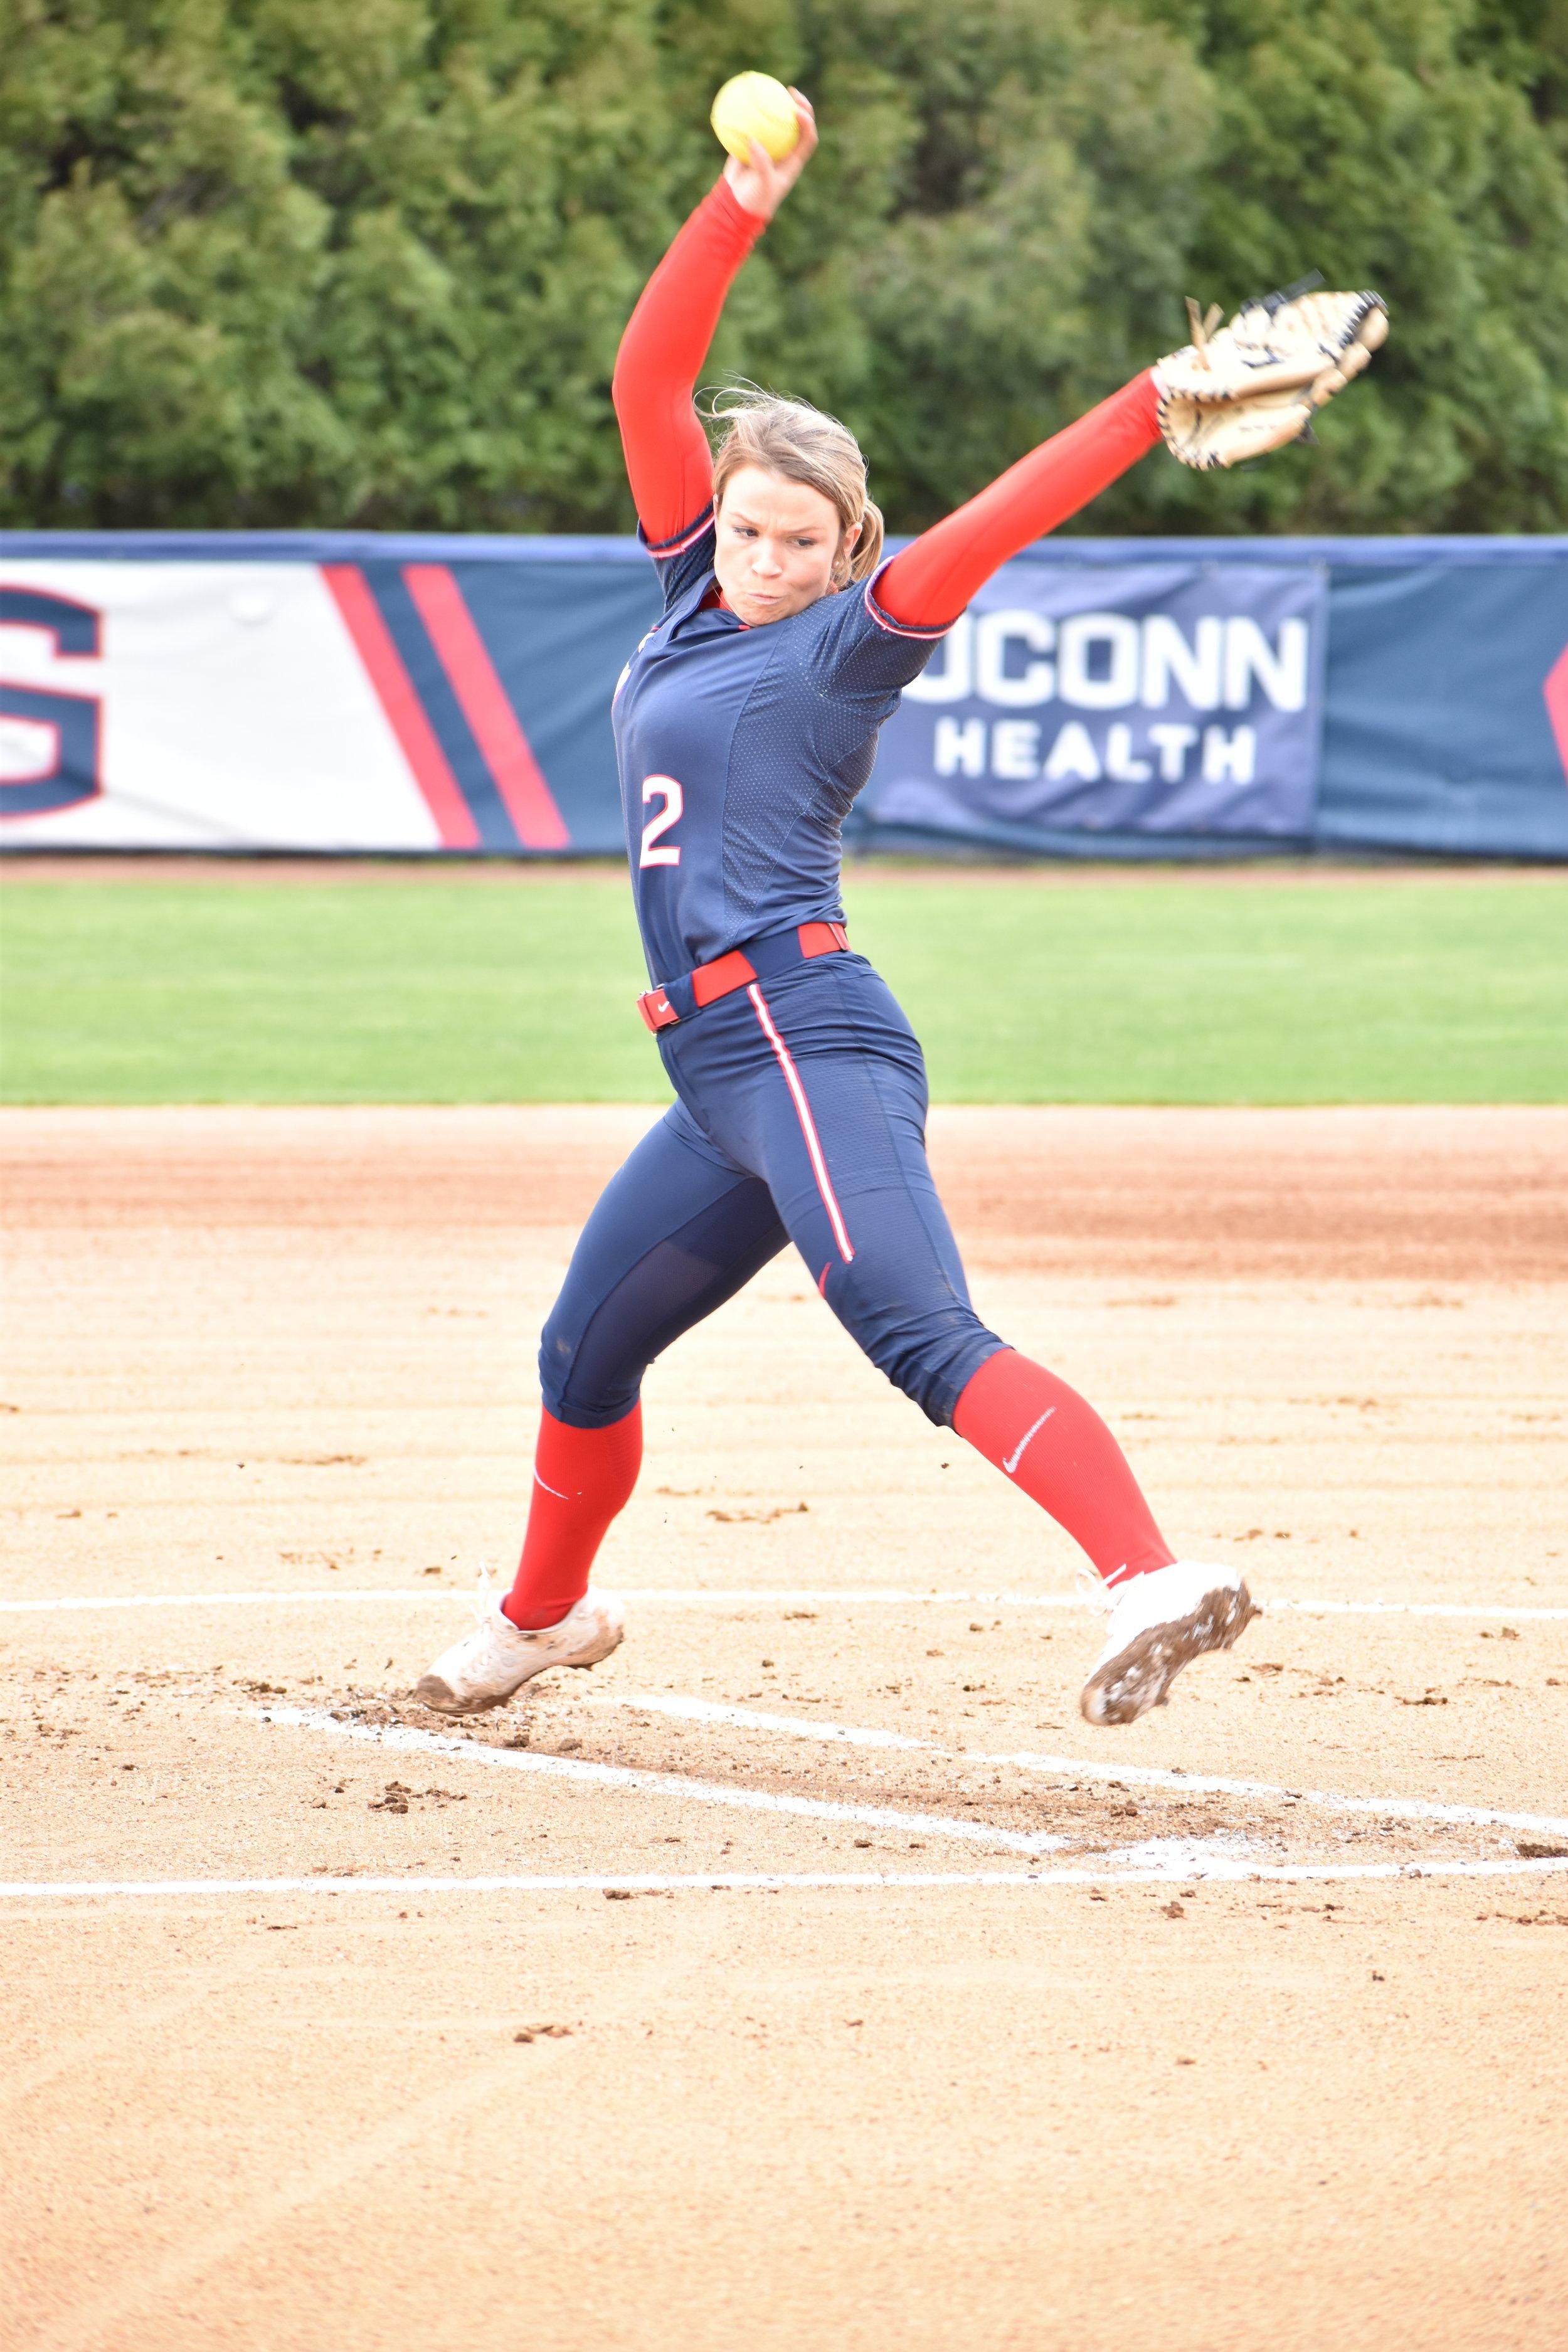 Jill Stockley UConn Softball. (Photo by Hanaisha Lewis/The Daily Campus)